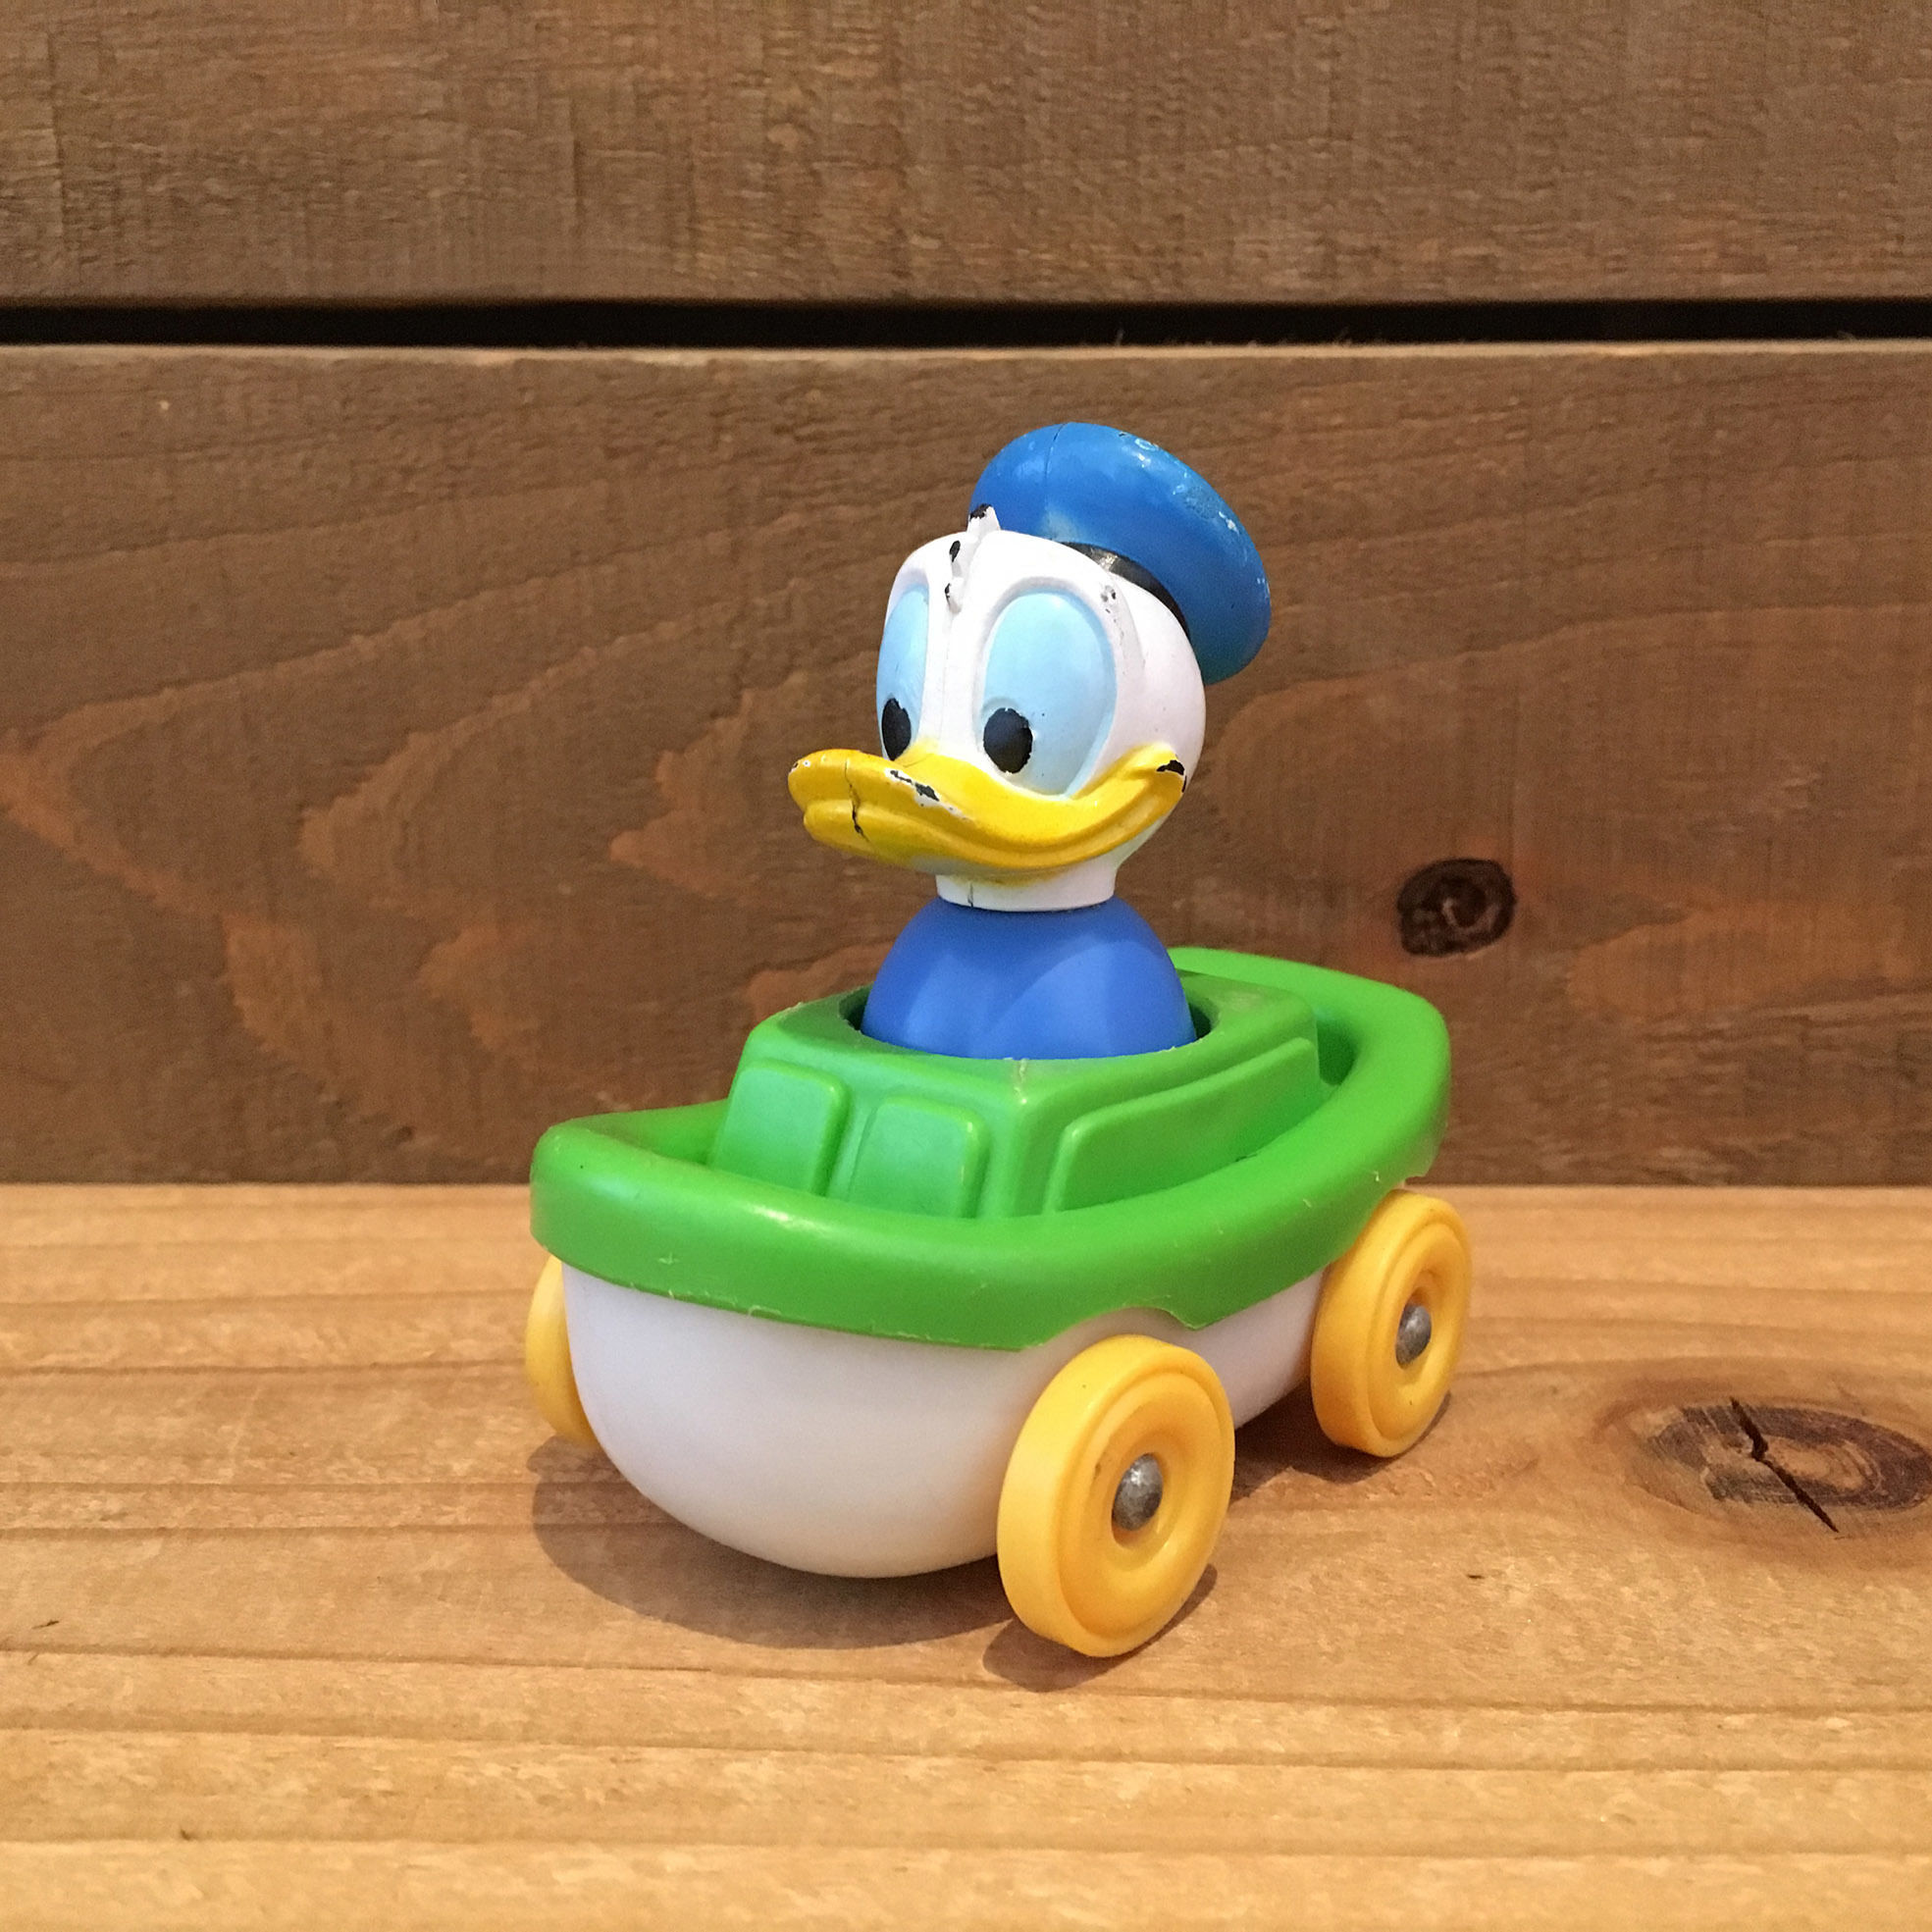 Disney Donald Duck Toy Car/ディズニー ドナルド・ダック トイカー/18401-5